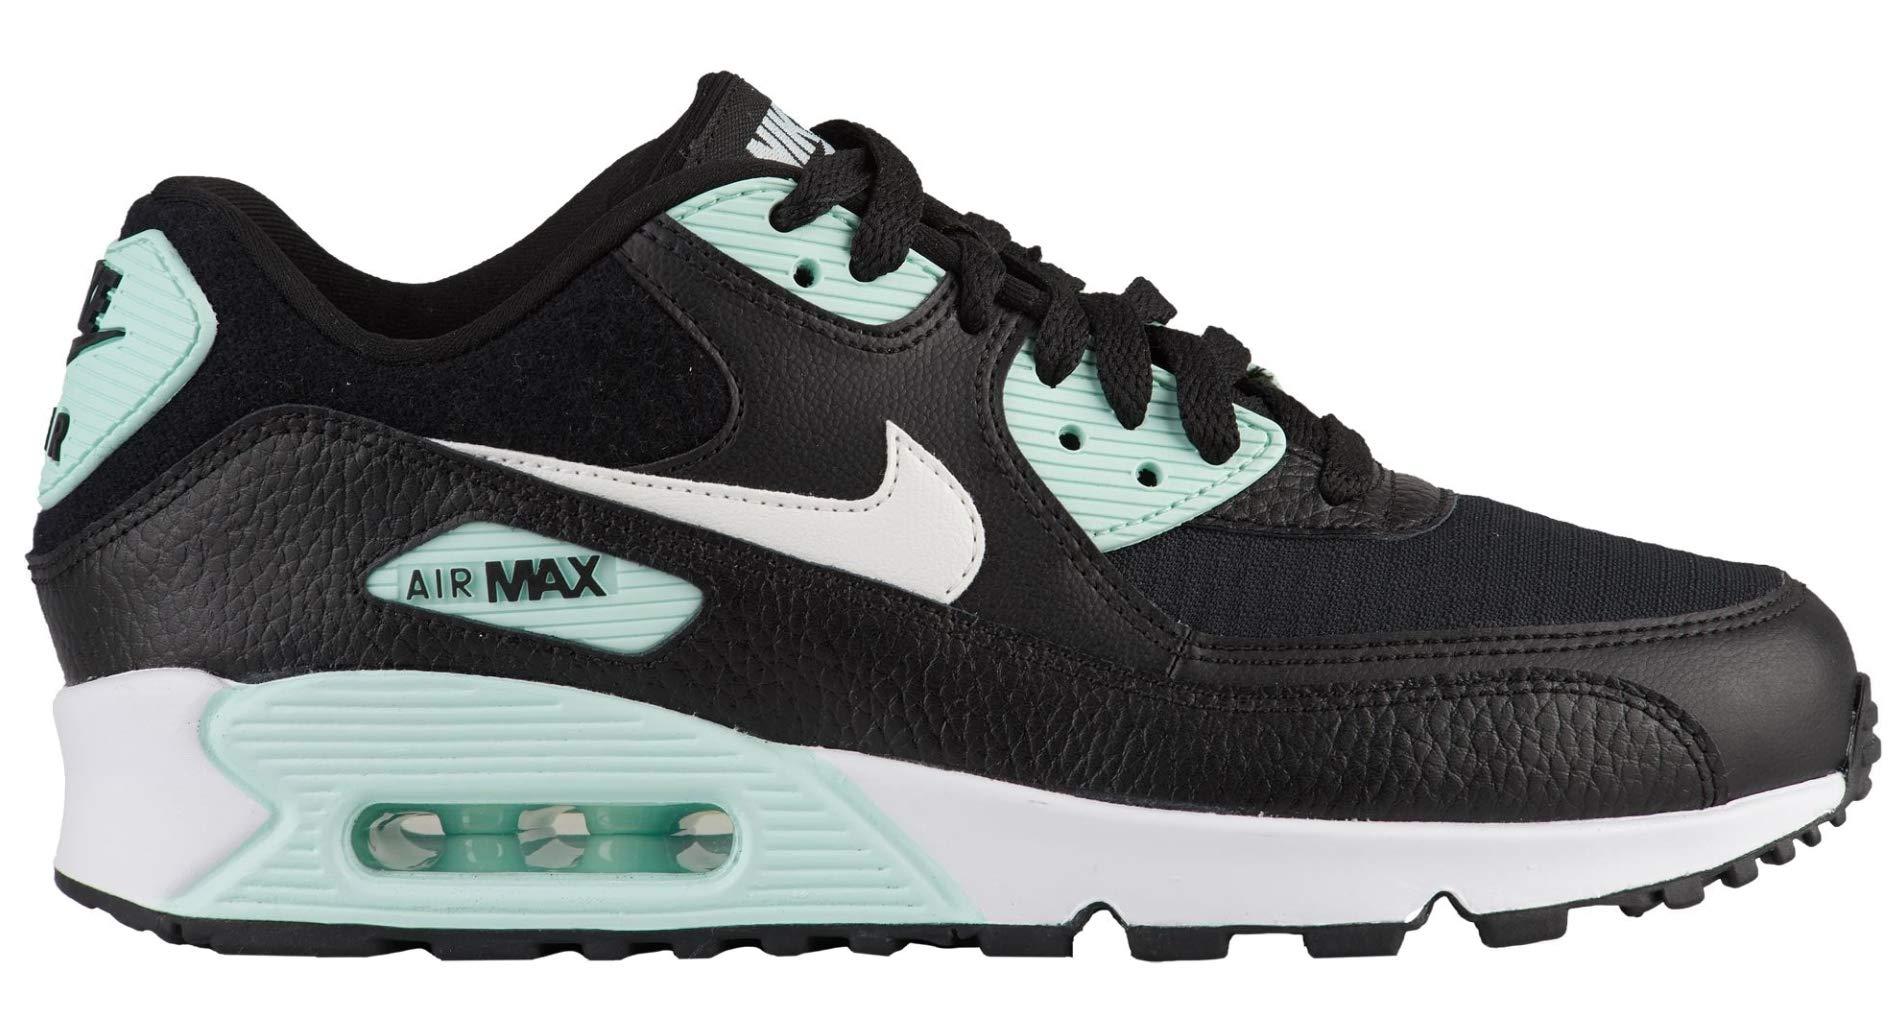 reputable site 8e5c7 7a62f Galleon - NIKE Women s Air Max Axis Running Shoe, Black Summit  White Igloo White, 11